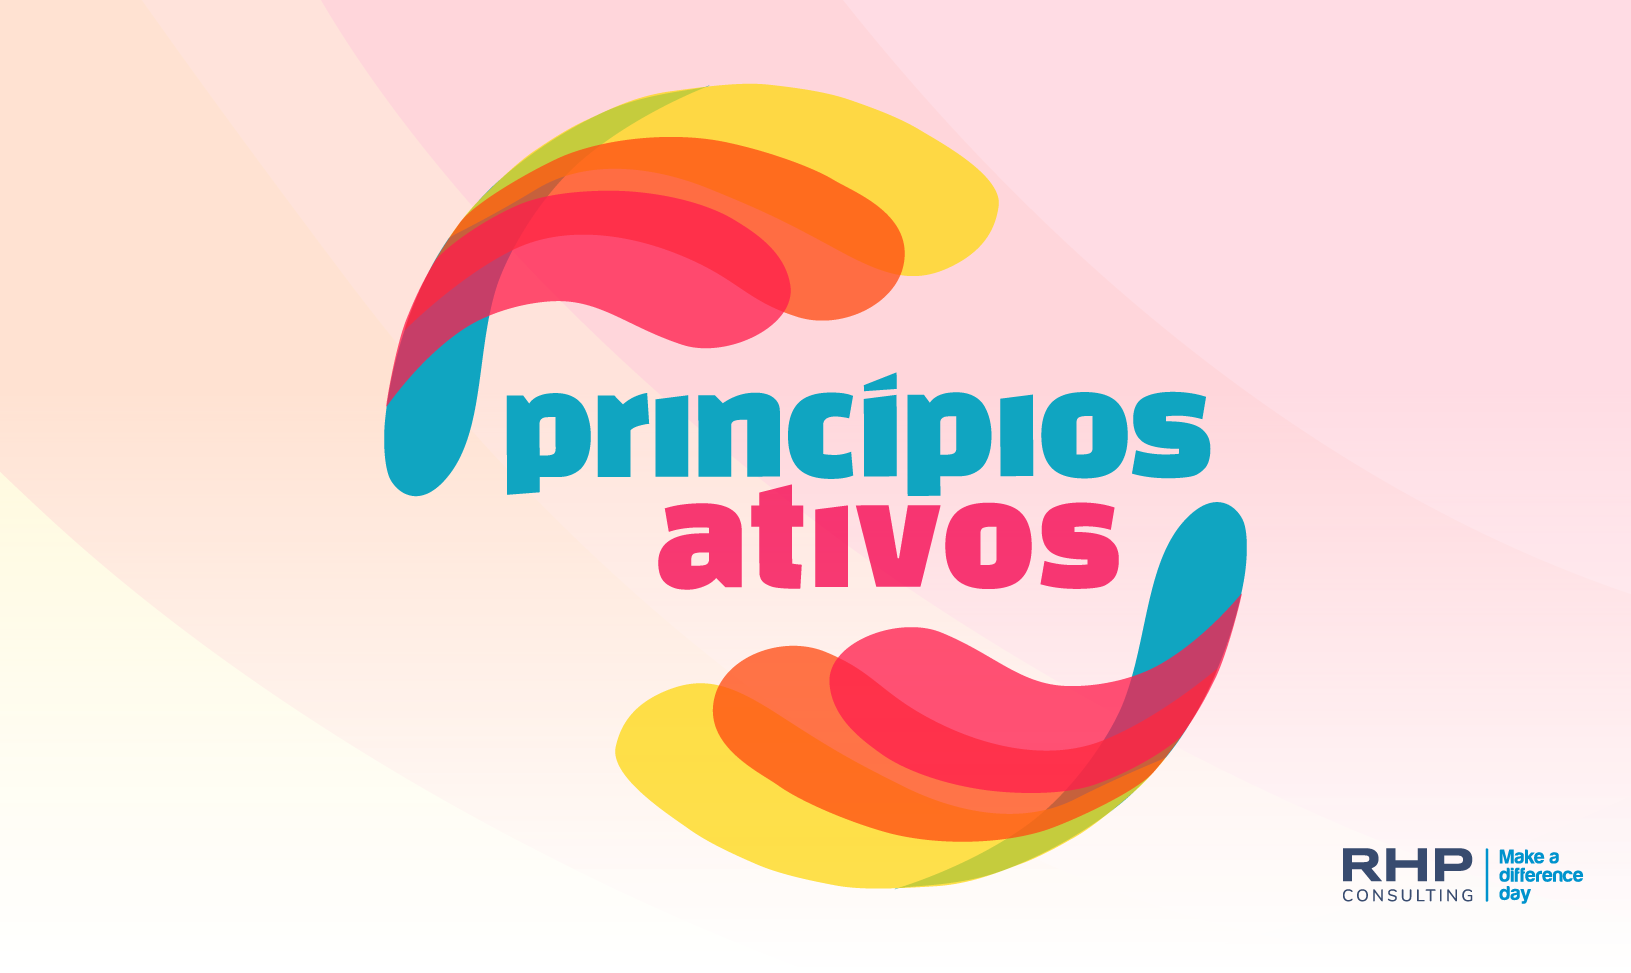 Principios-activos